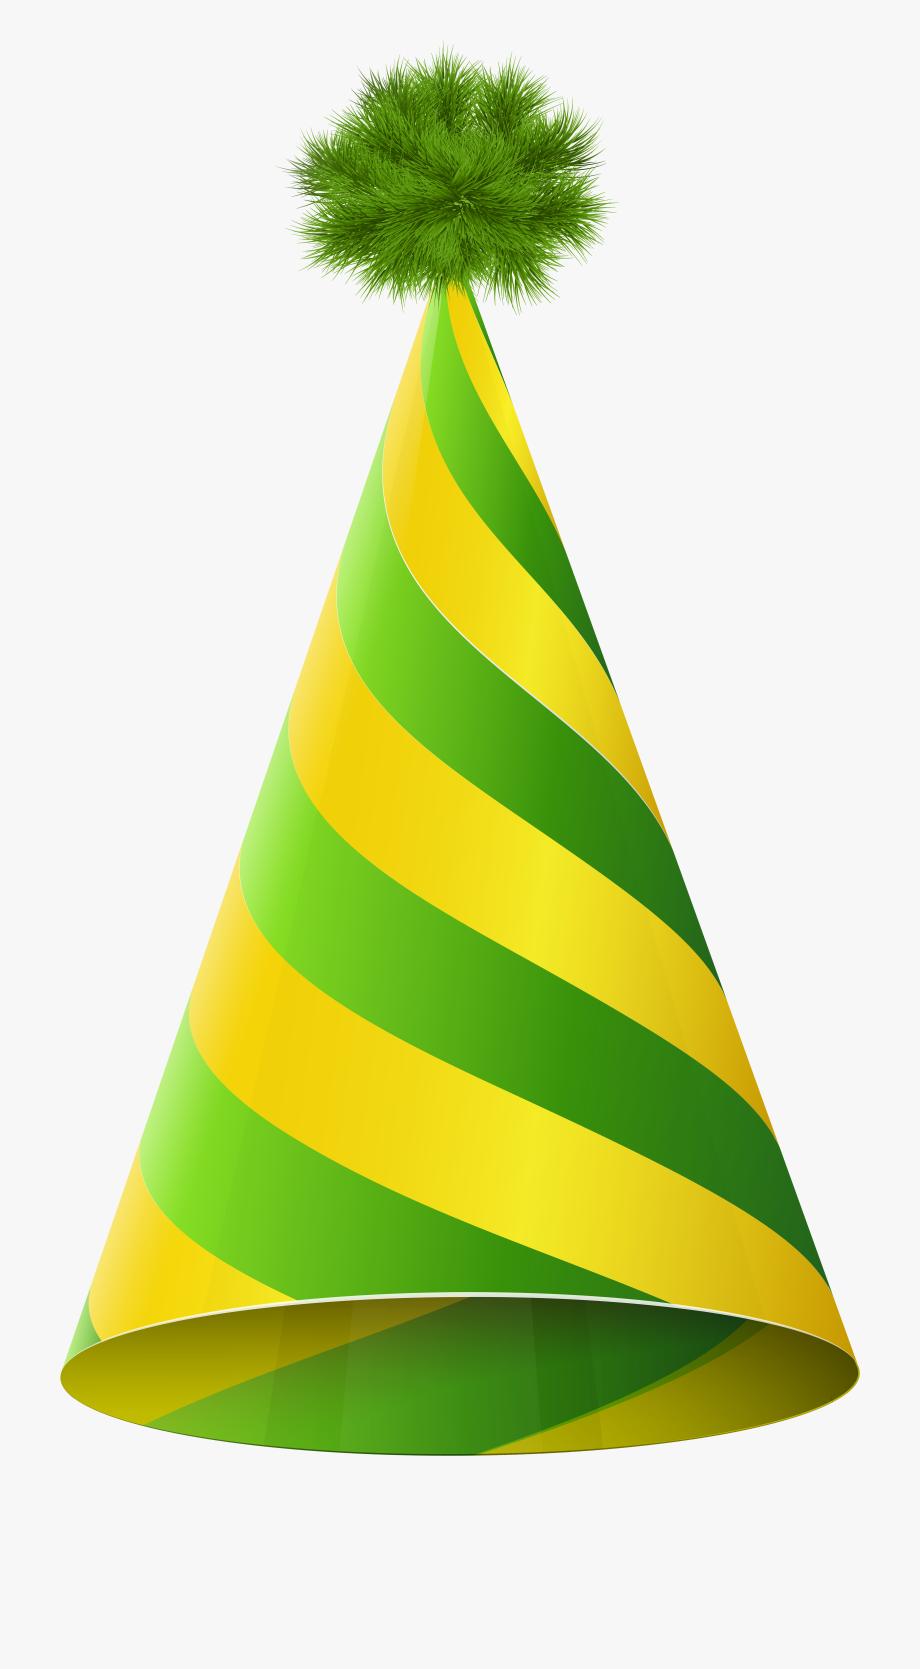 Party Hat Green Yellow Transparent Png Clip Art Imageu200b.